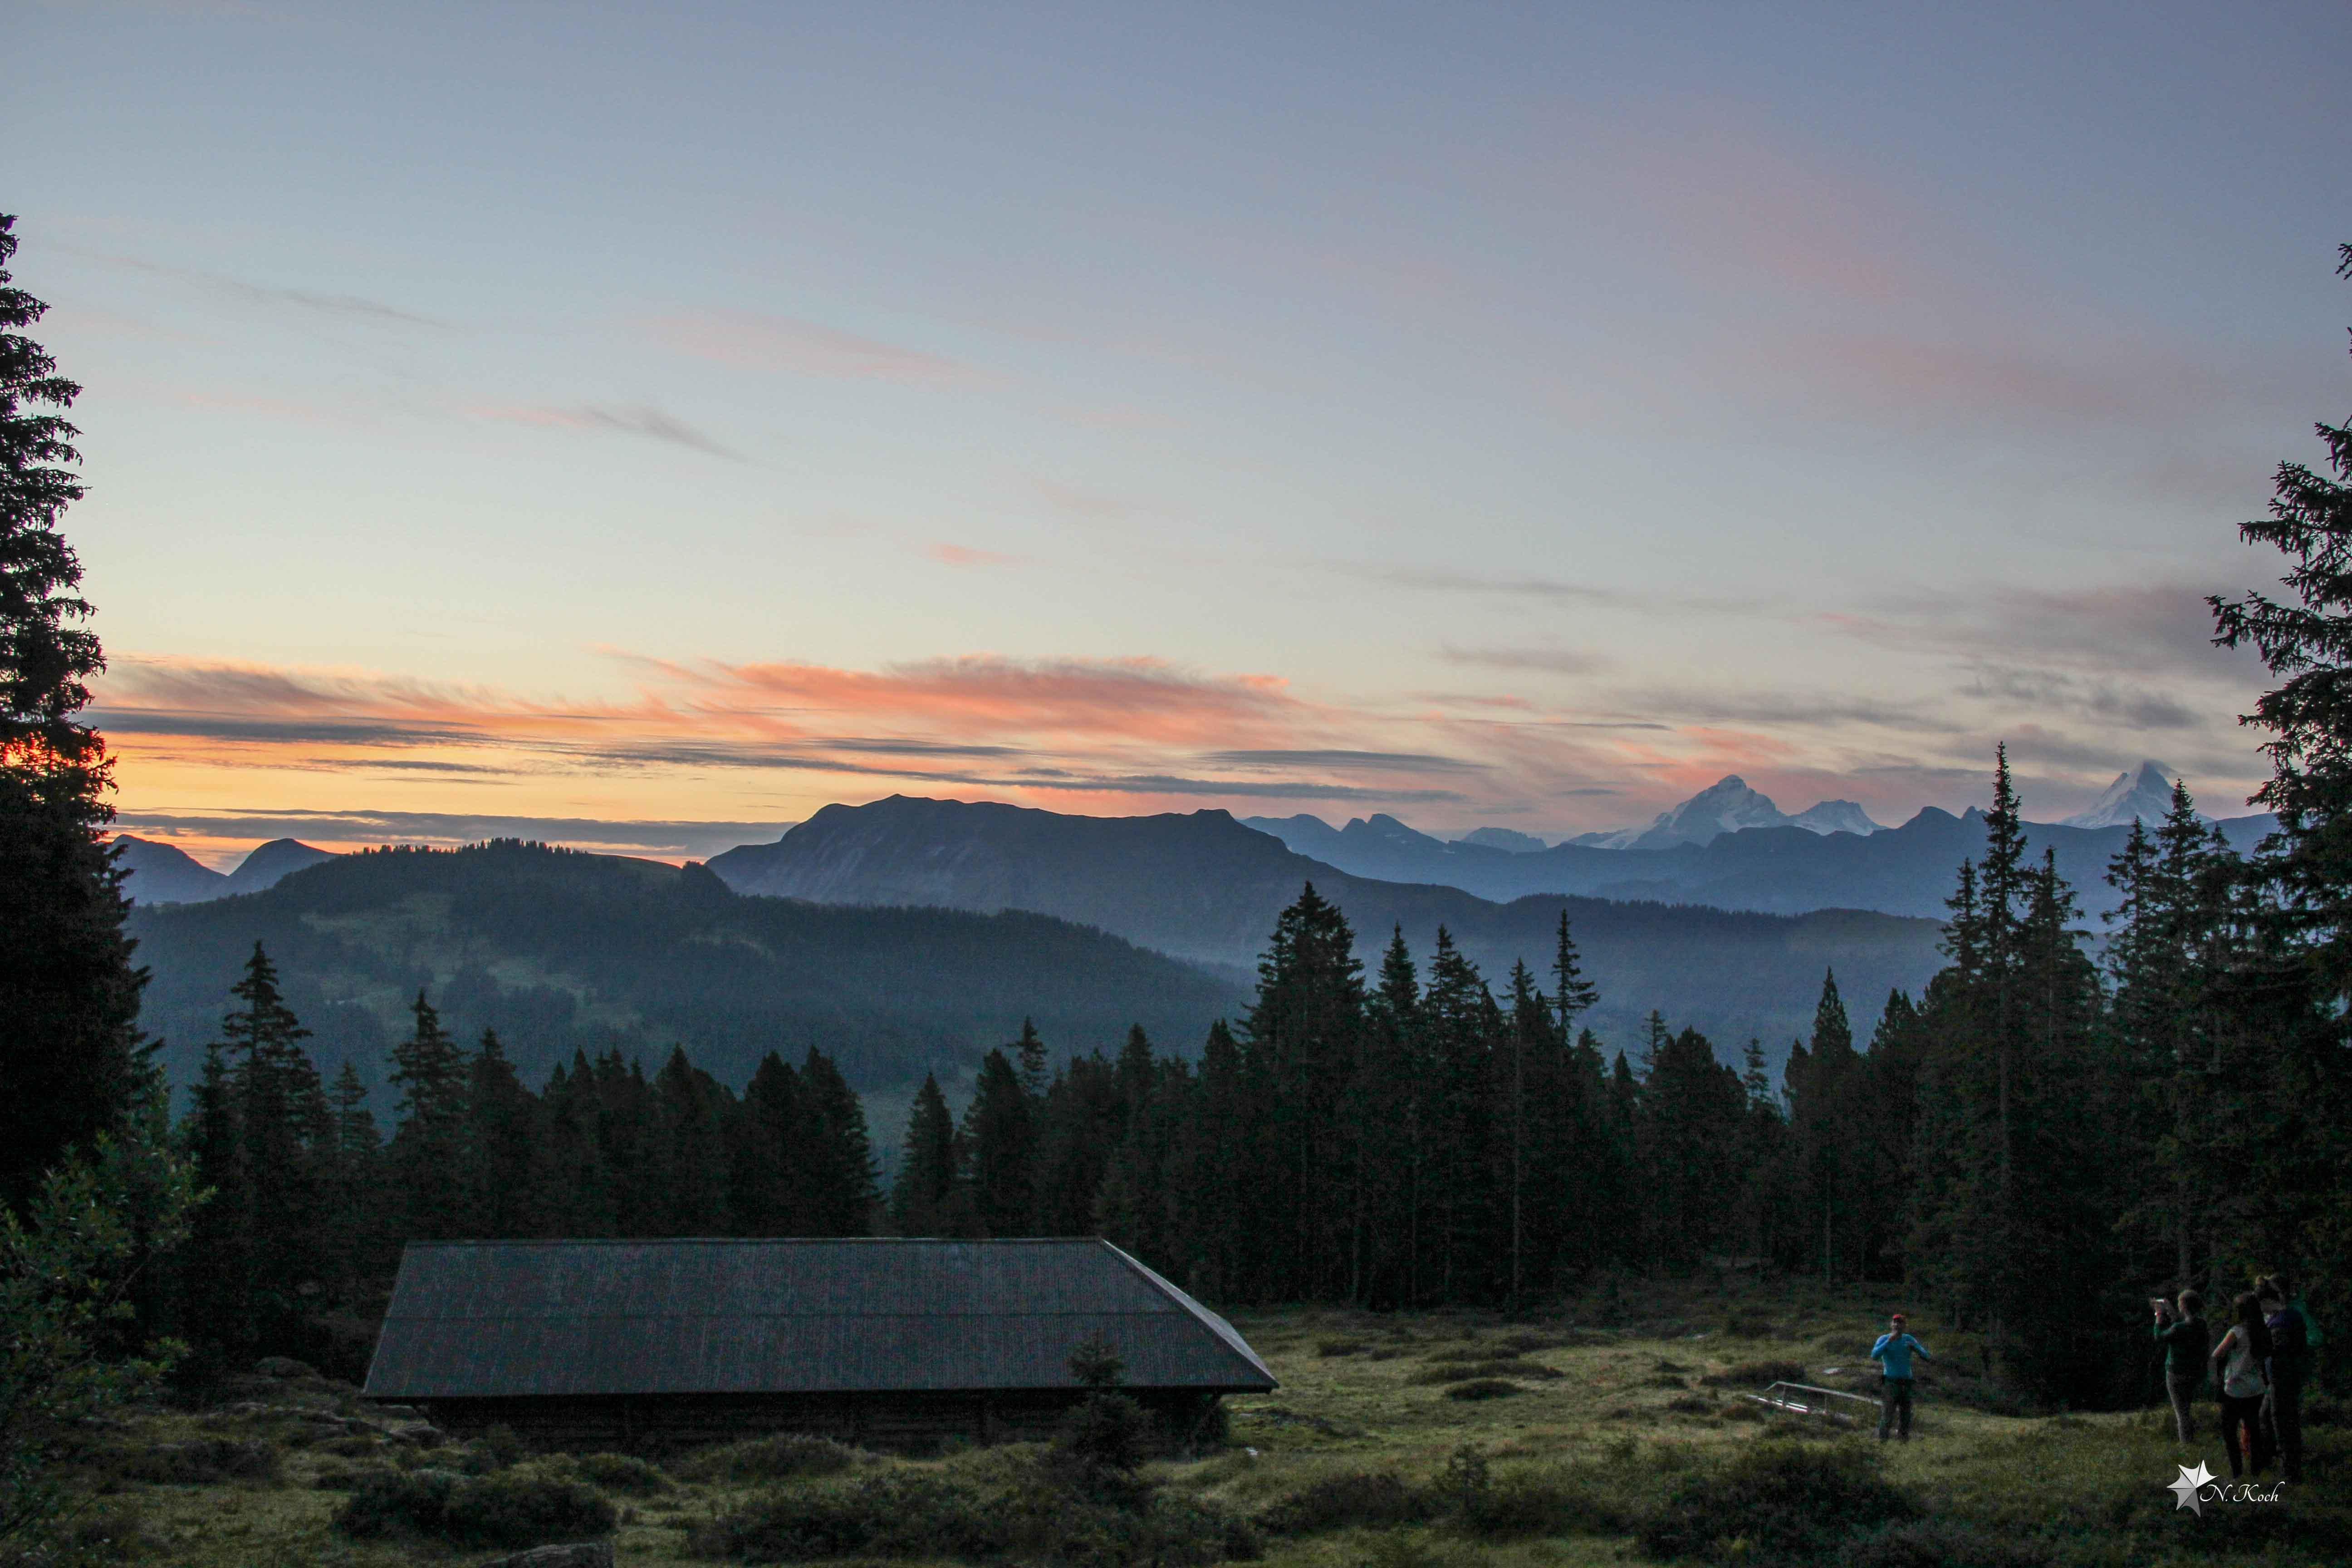 2014, Switzerland | Sunrise in the Alps